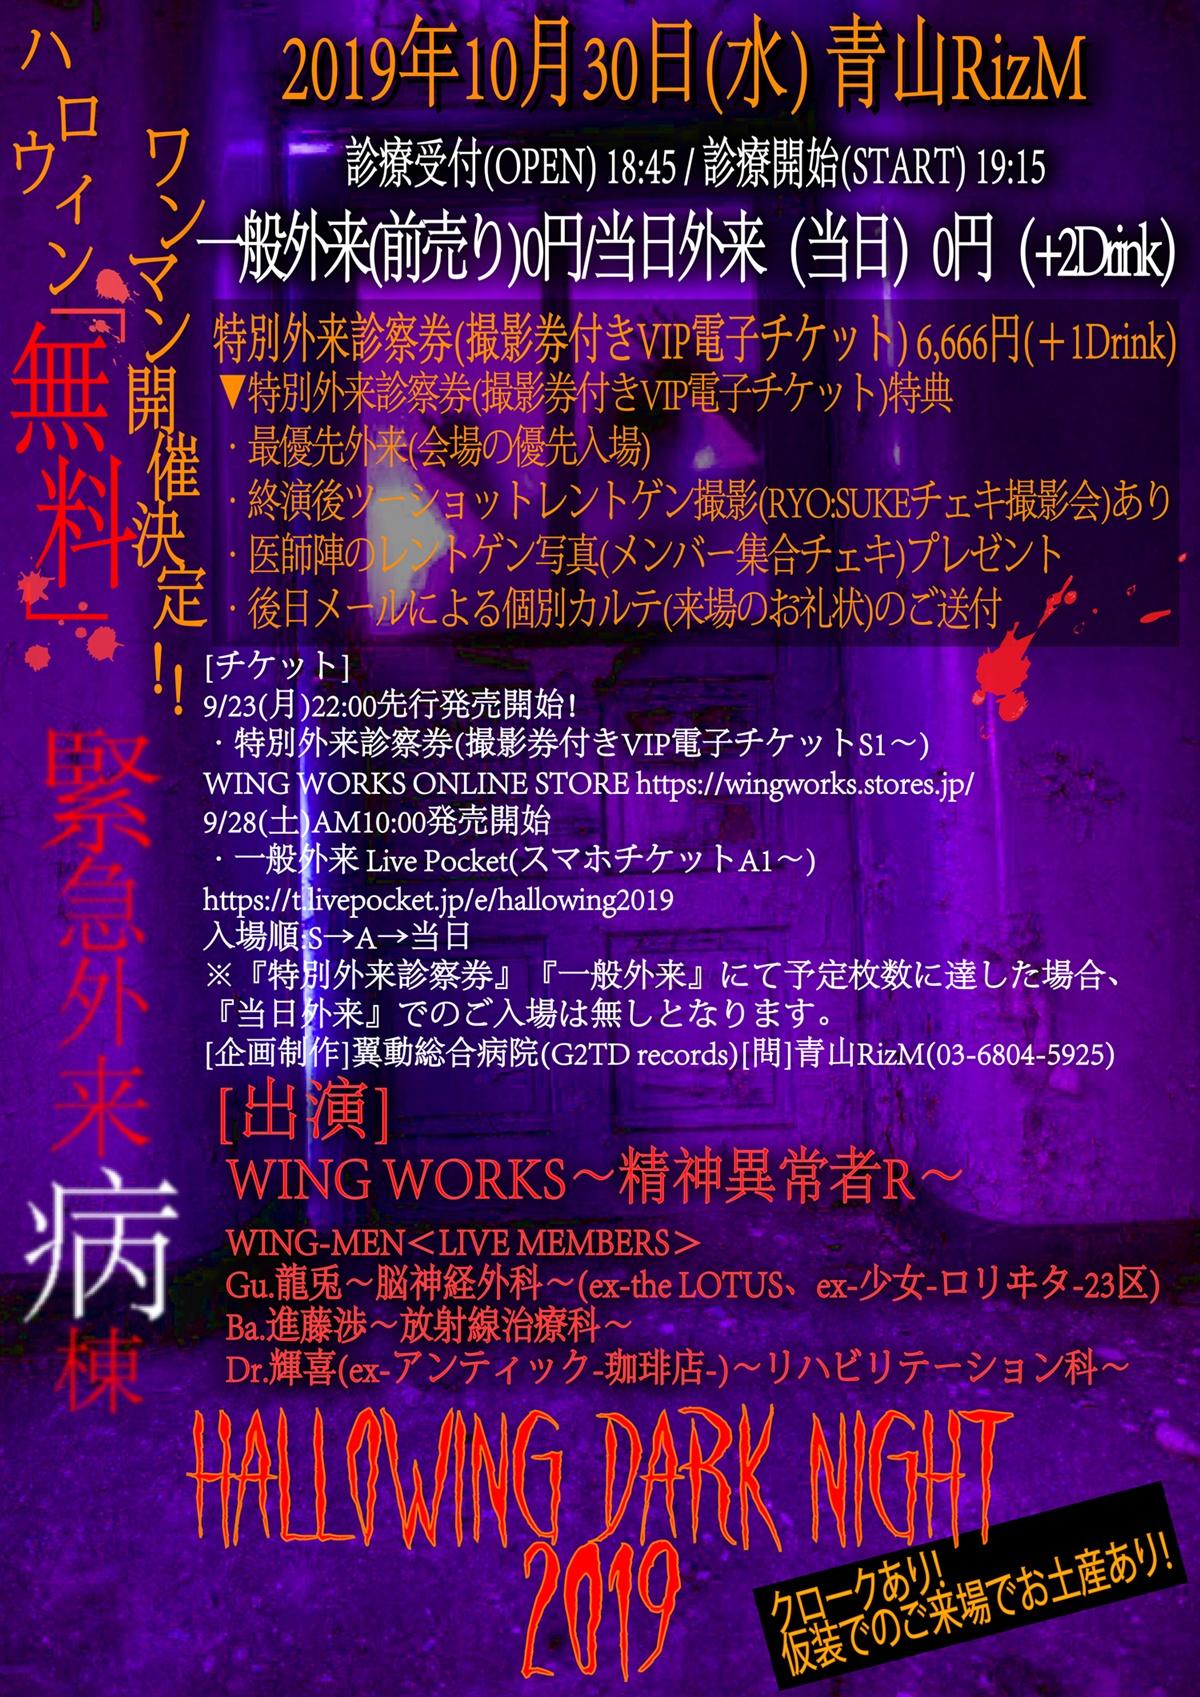 WING WORKS無料ONEMAN『HALLOWING DARK NIGHT 2019~緊急外来病棟~』